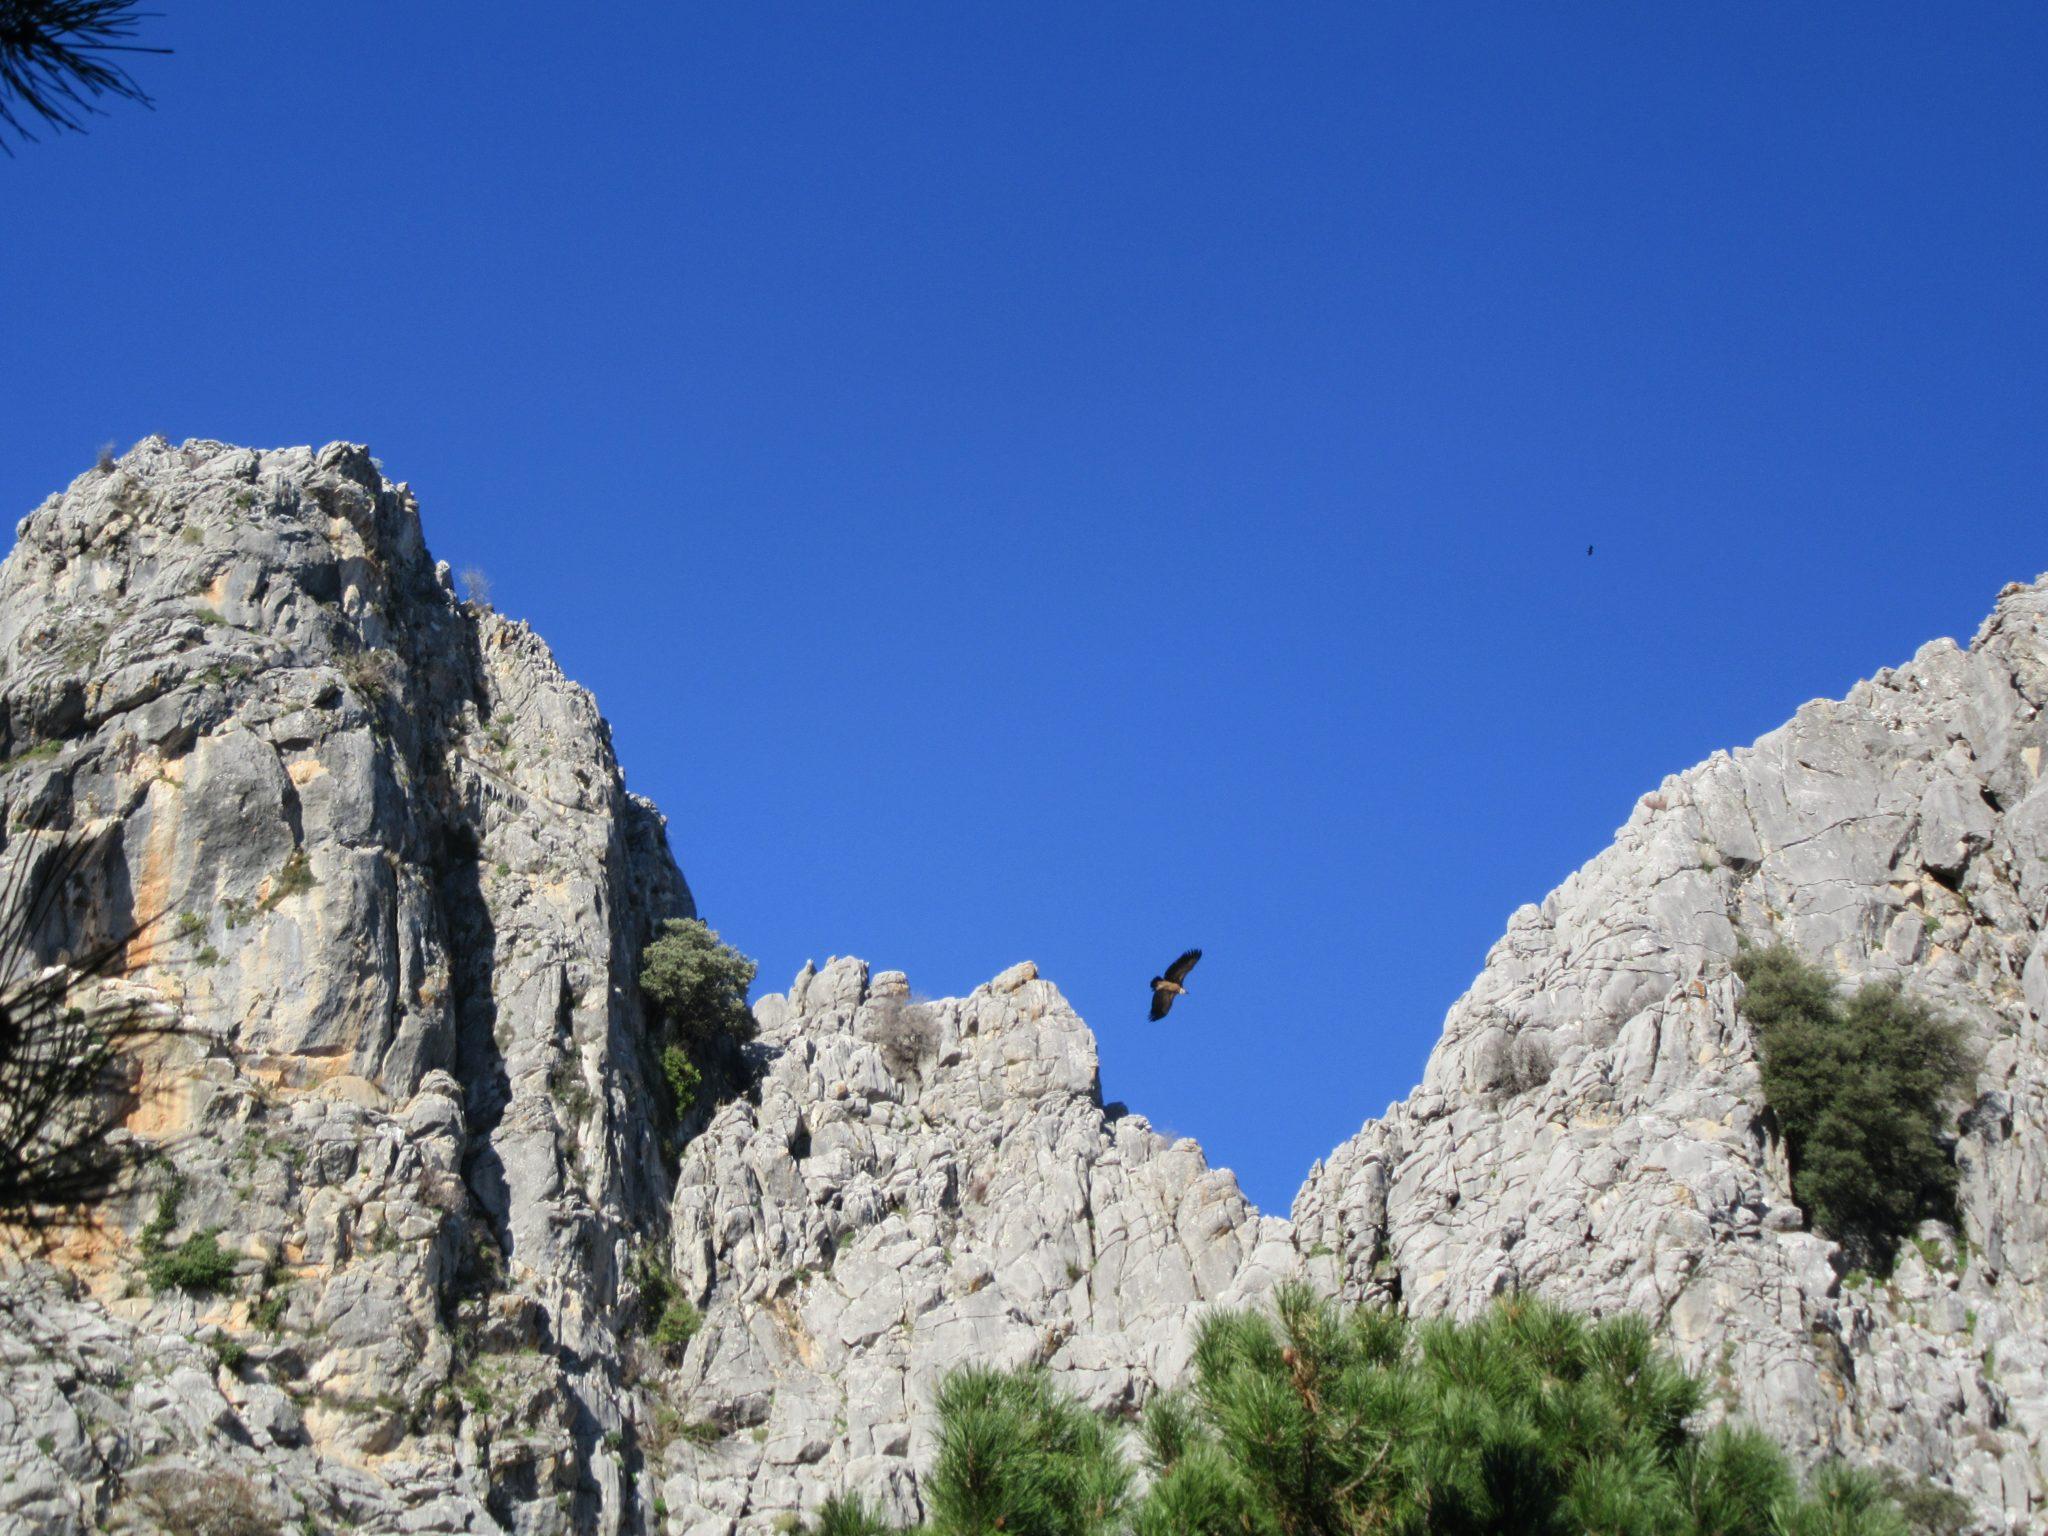 Birdlife Vultures nature great walking